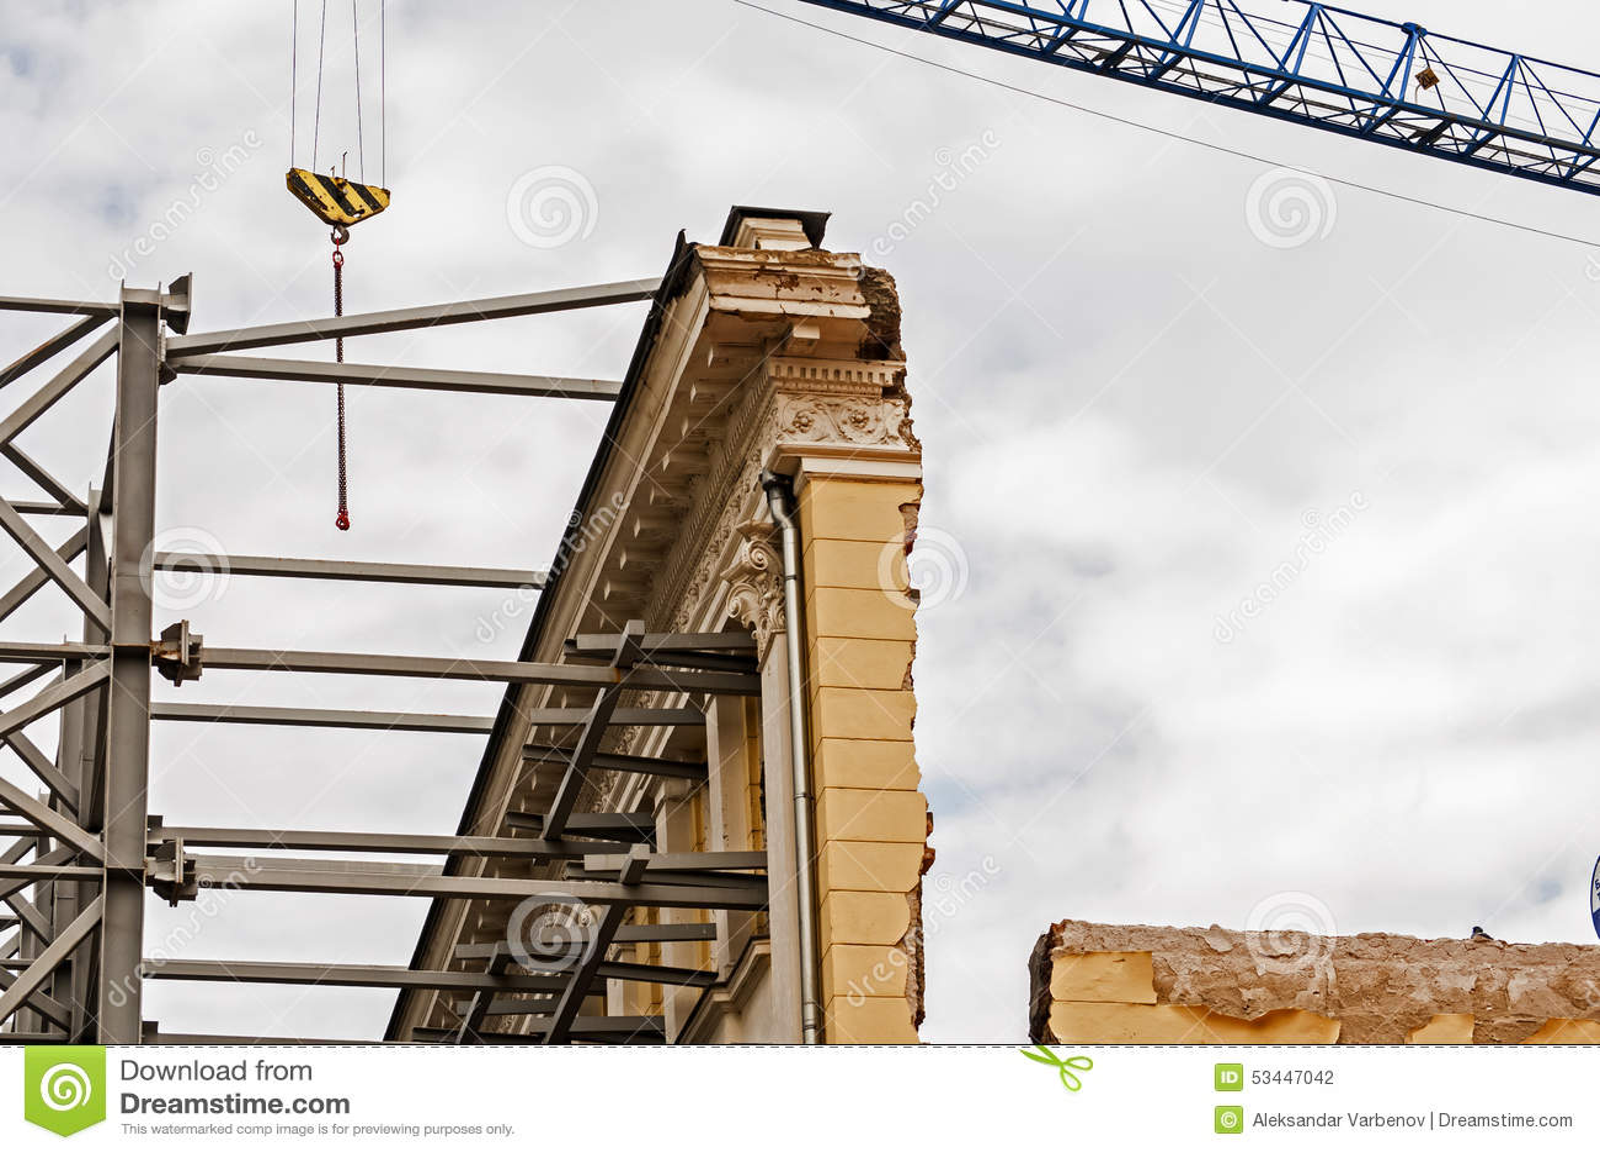 Building Construction Technologies